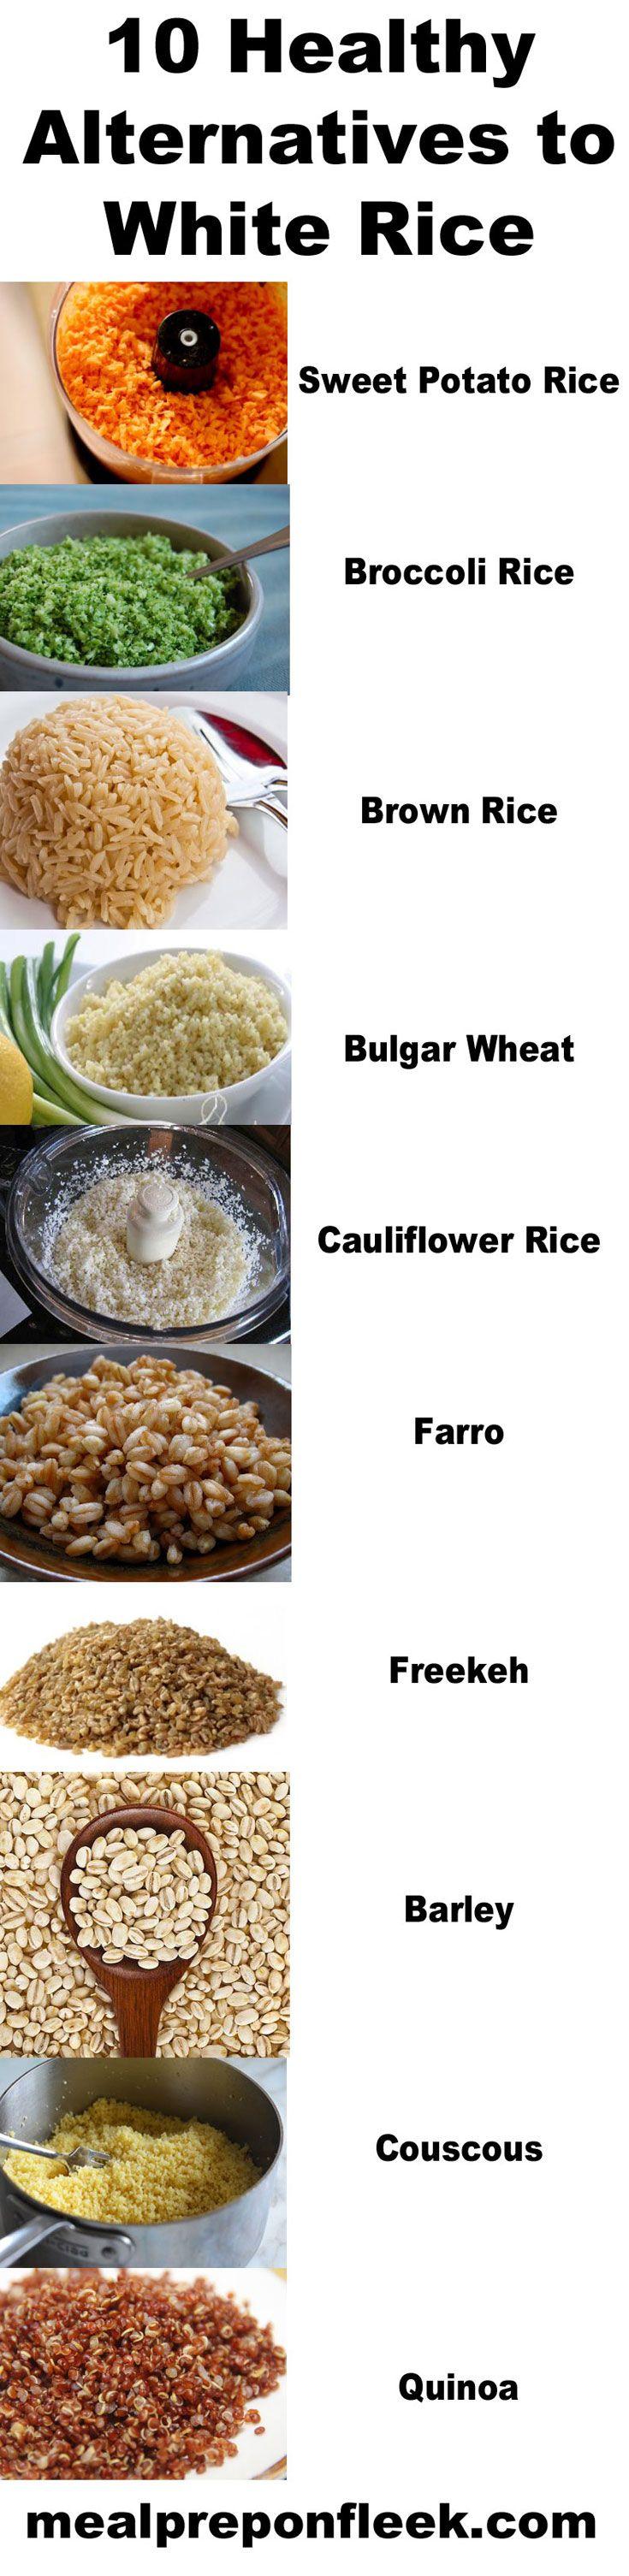 10 Healthy Alternatives to White Rice plus Recipes